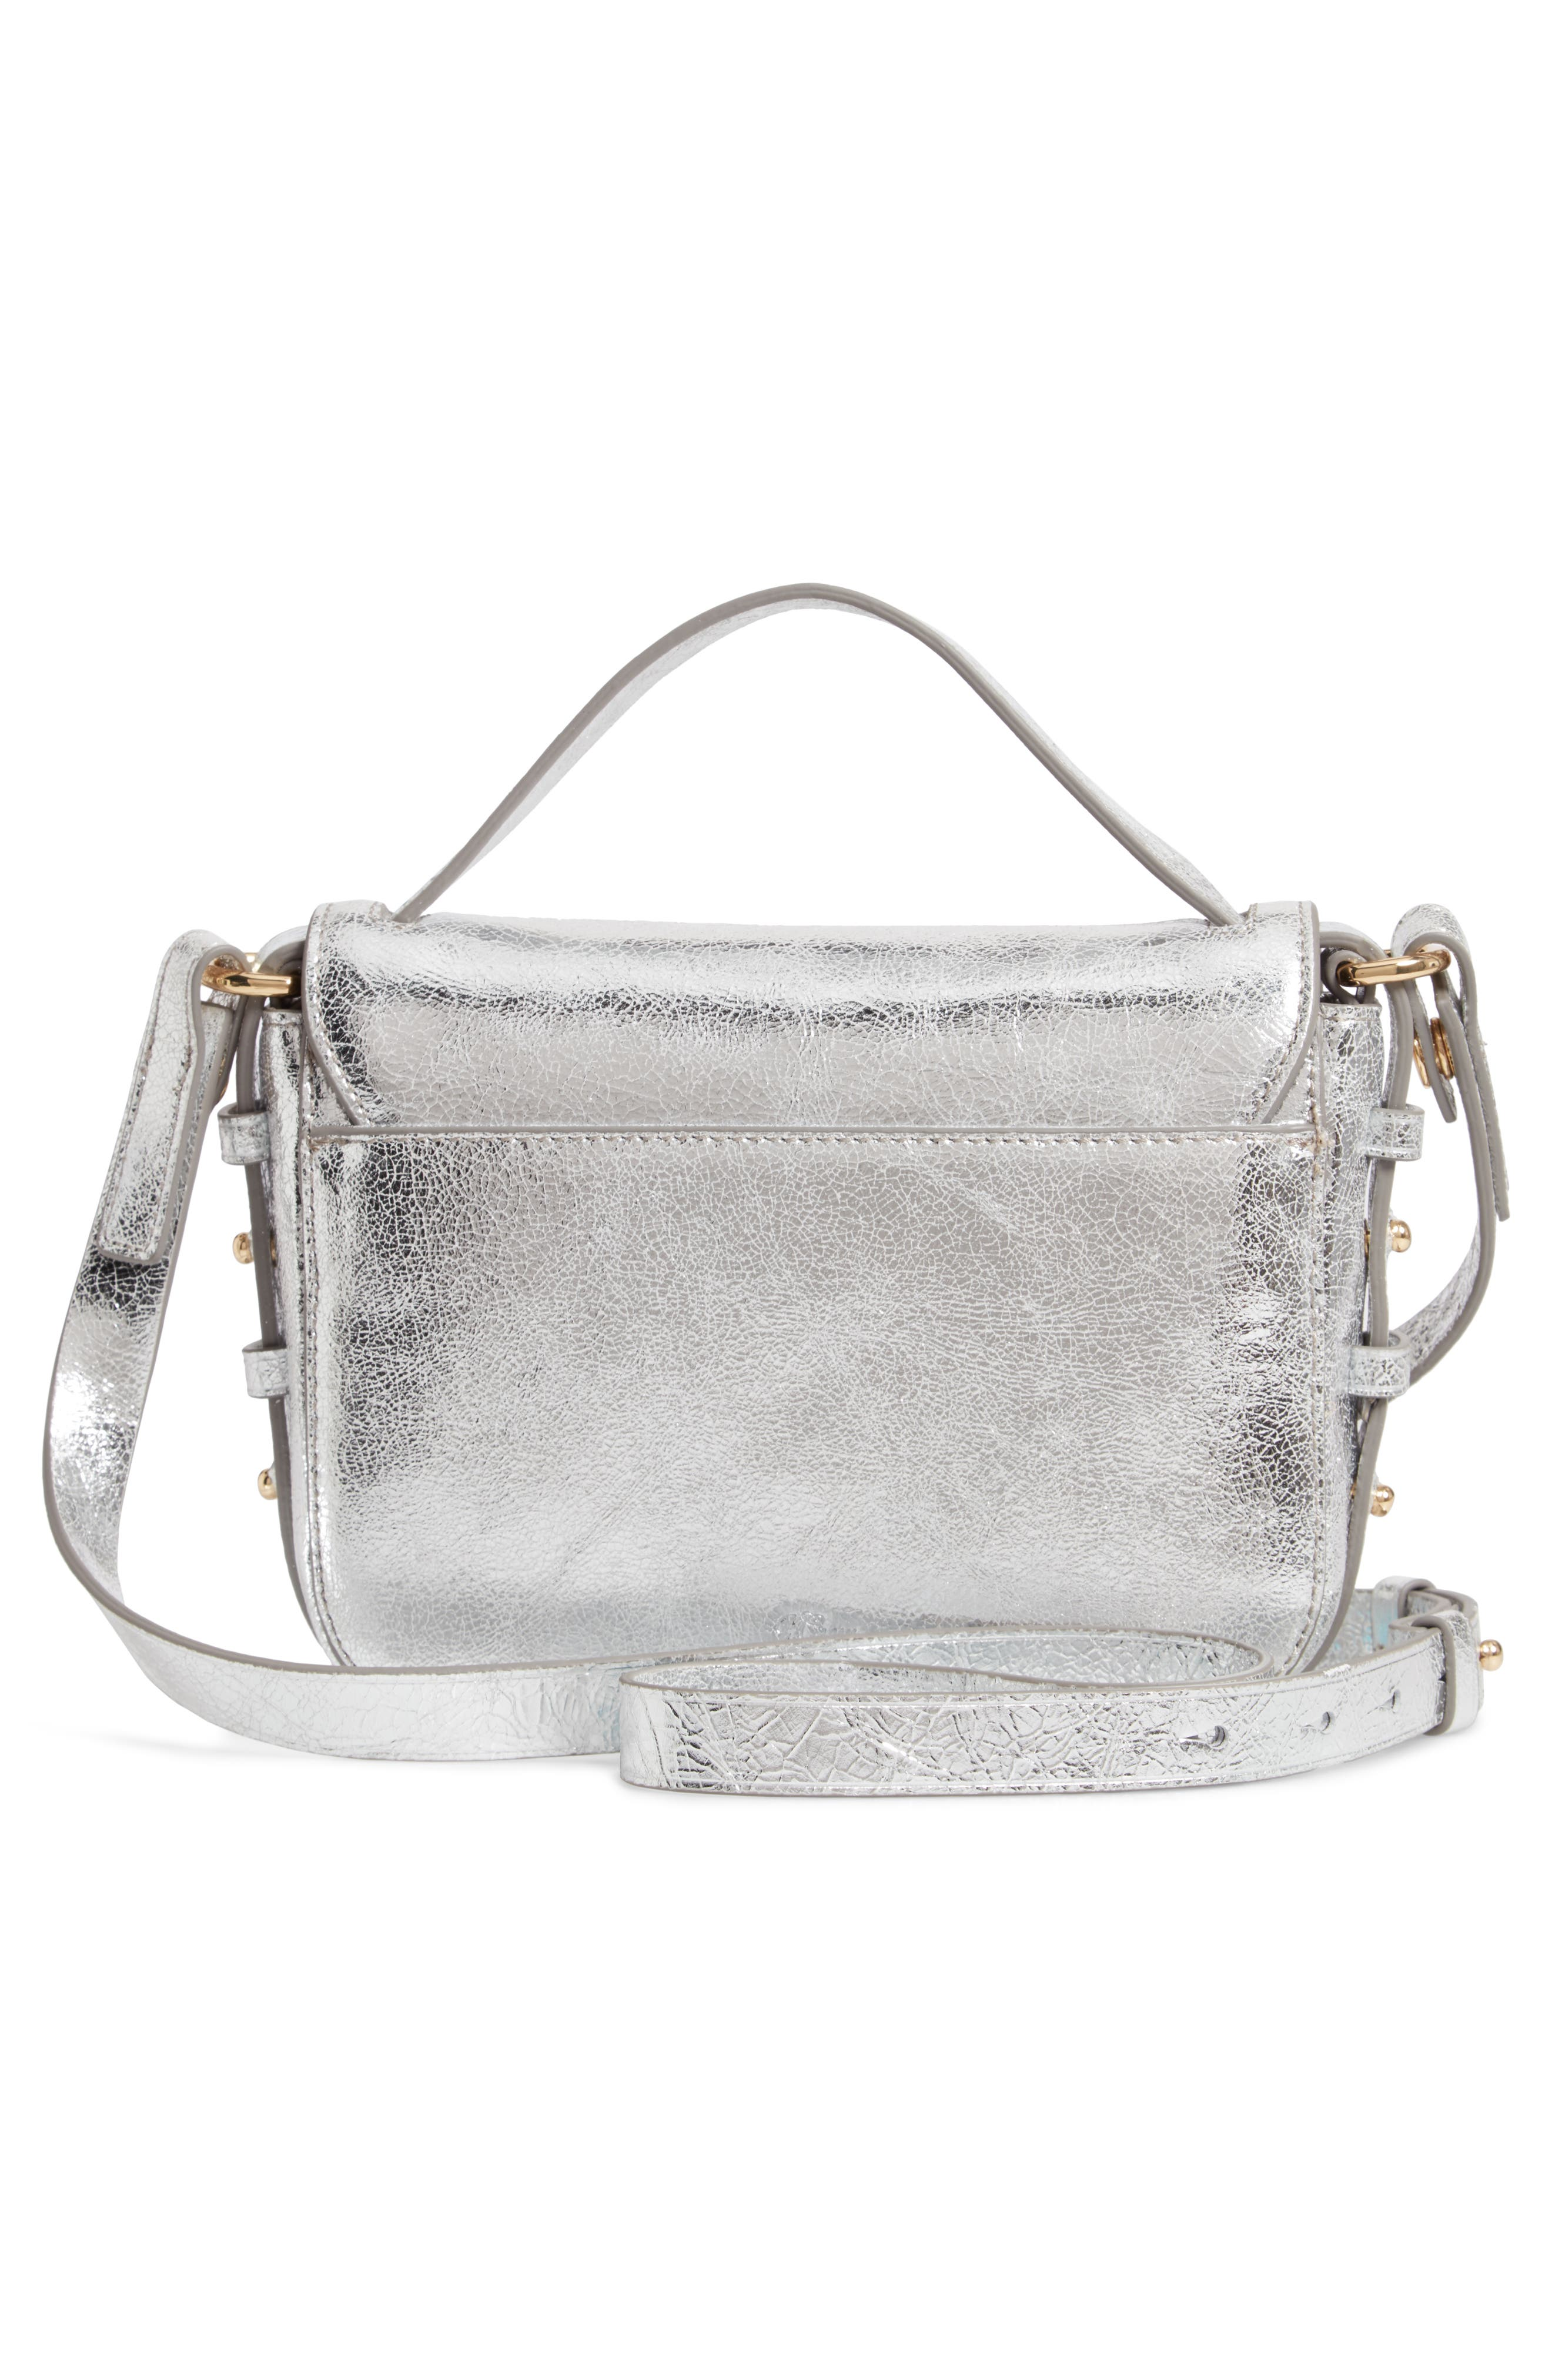 Harper Metallic Leather Crossbody Bag,                             Alternate thumbnail 3, color,                             METALLIC SILVER